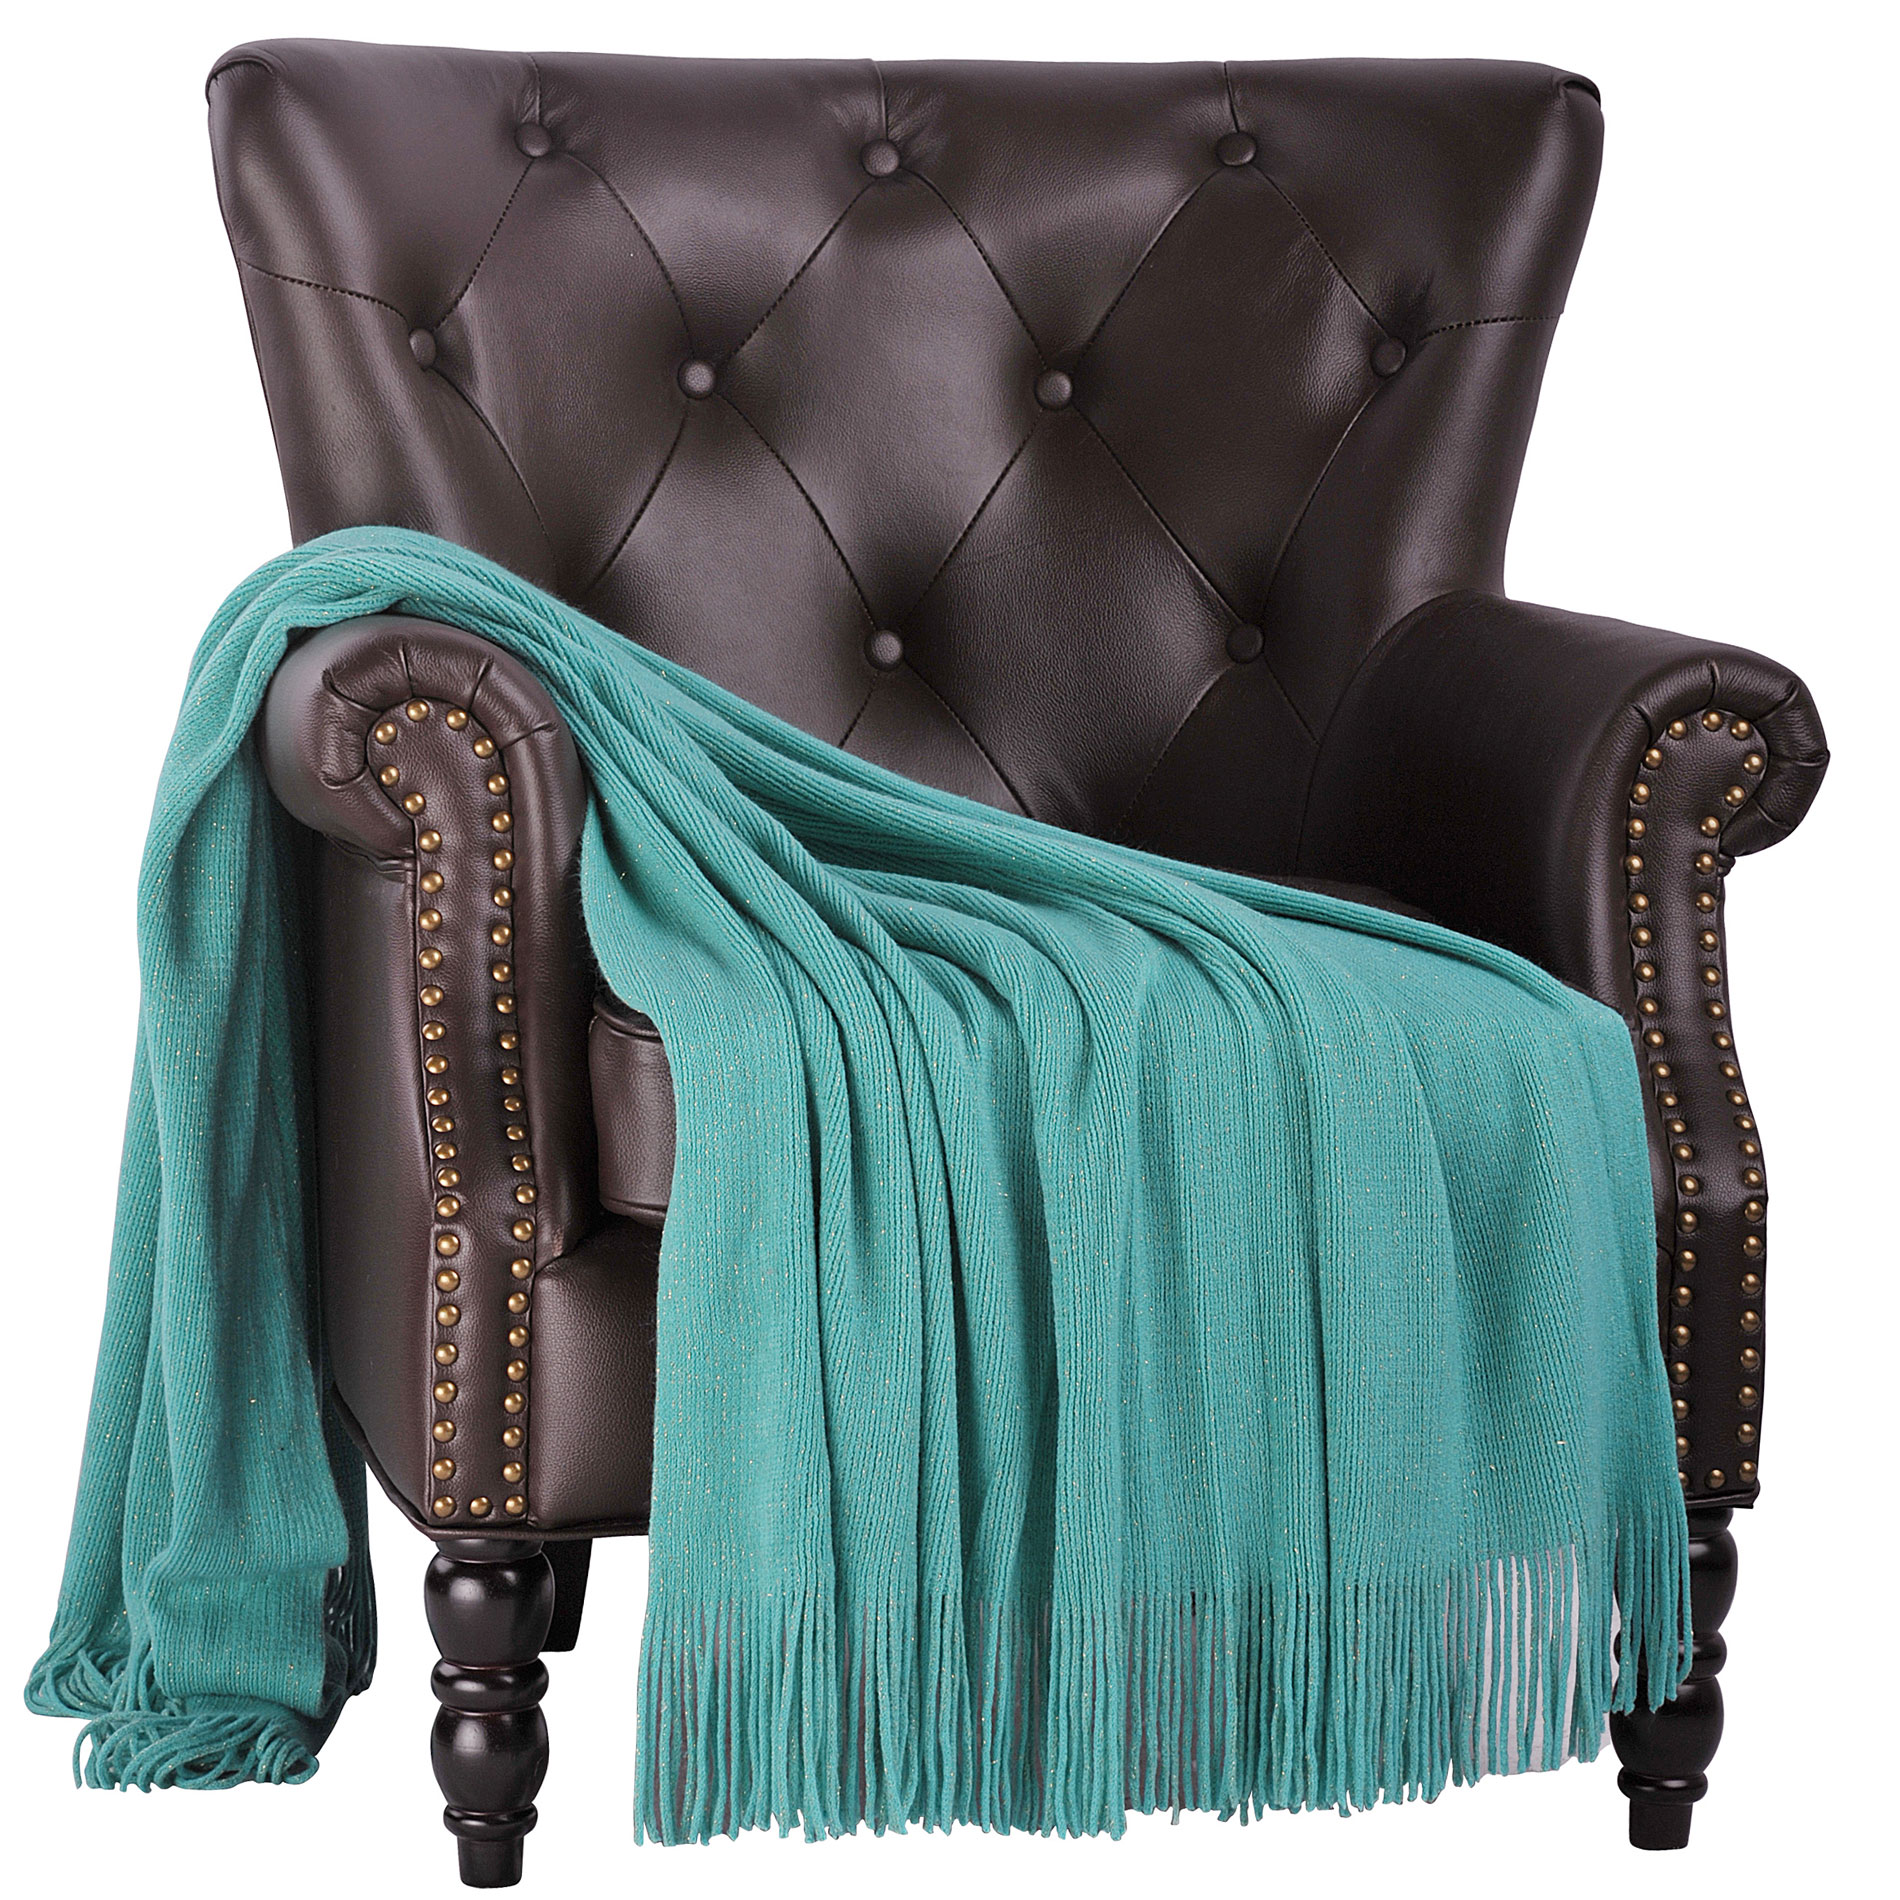 "BOON Glitter Knitted Throw Blanket, Blue Turquoise/Gold Metallic Yarn, 50"" x 60"""